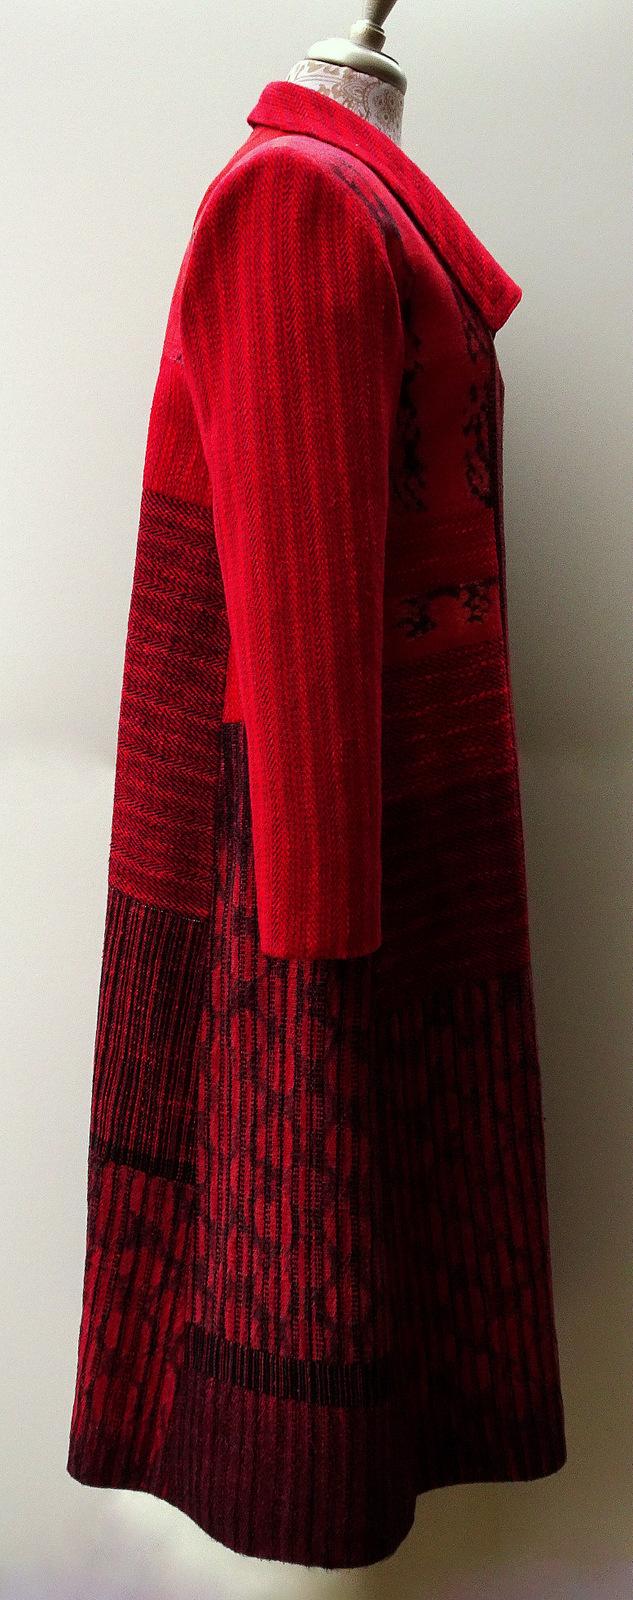 Handwoven Slow Fashion by Liz Spear-008.JPG